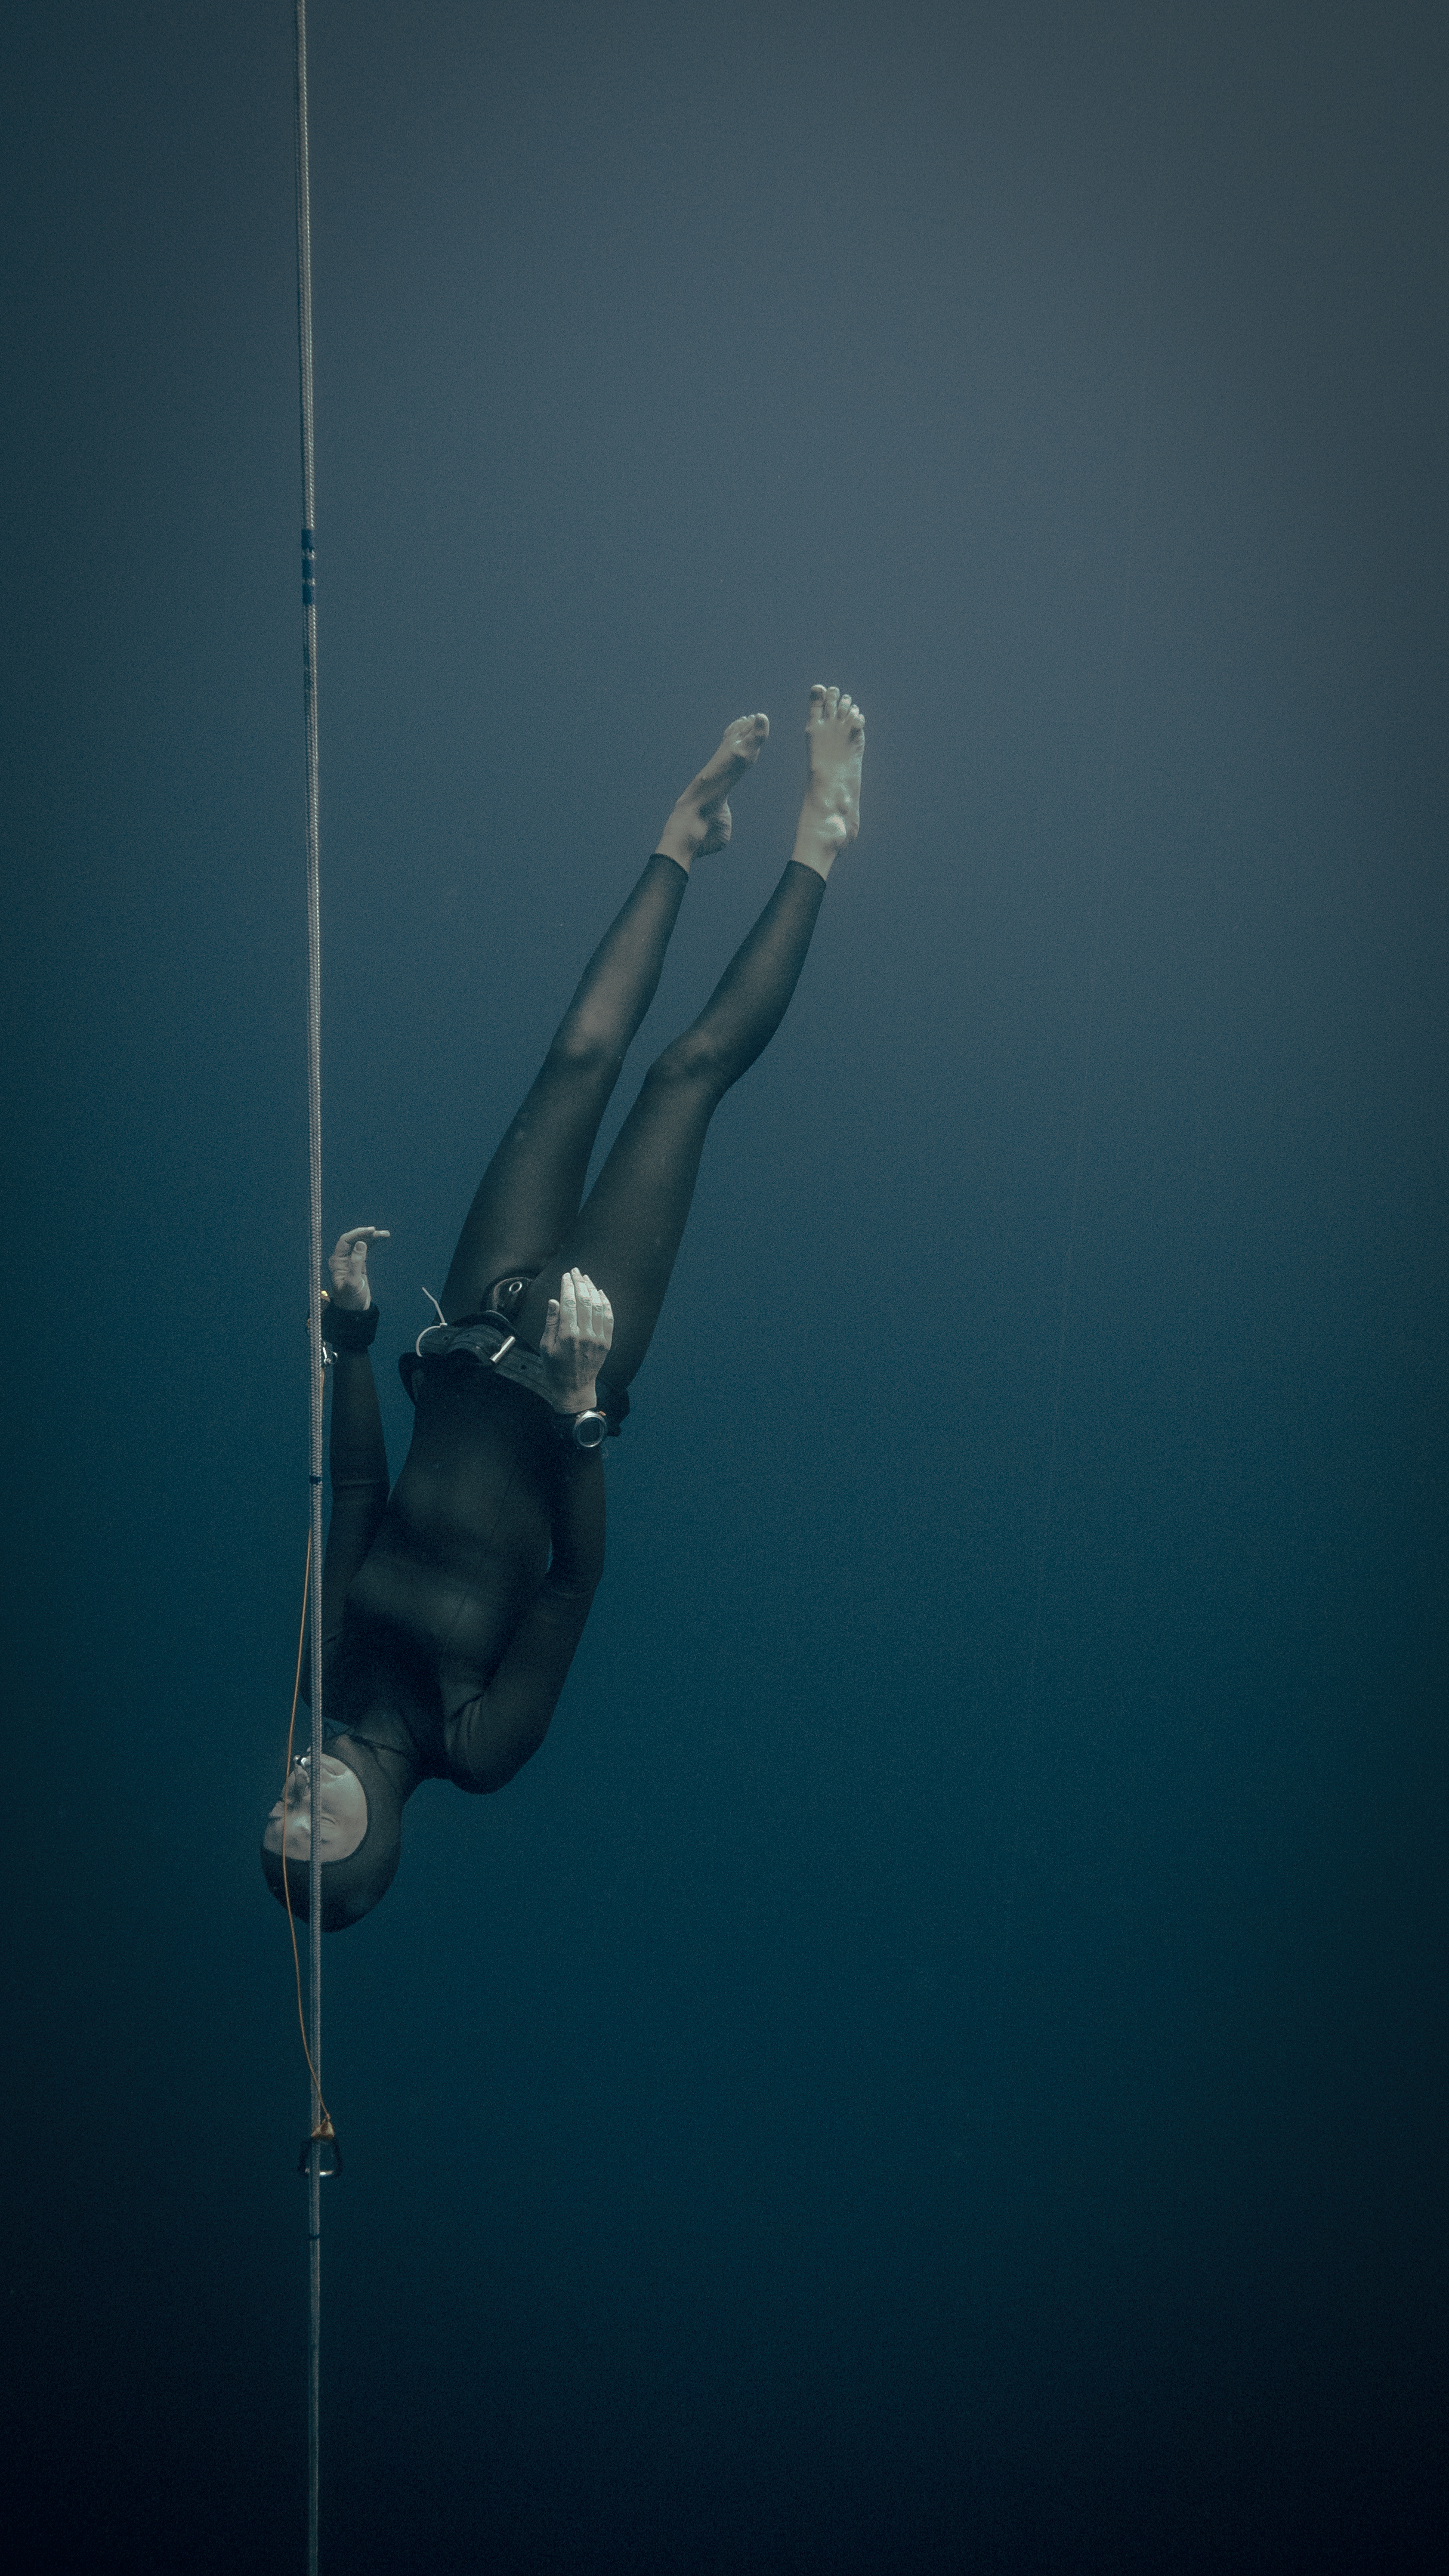 Freediver_2-24.jpg